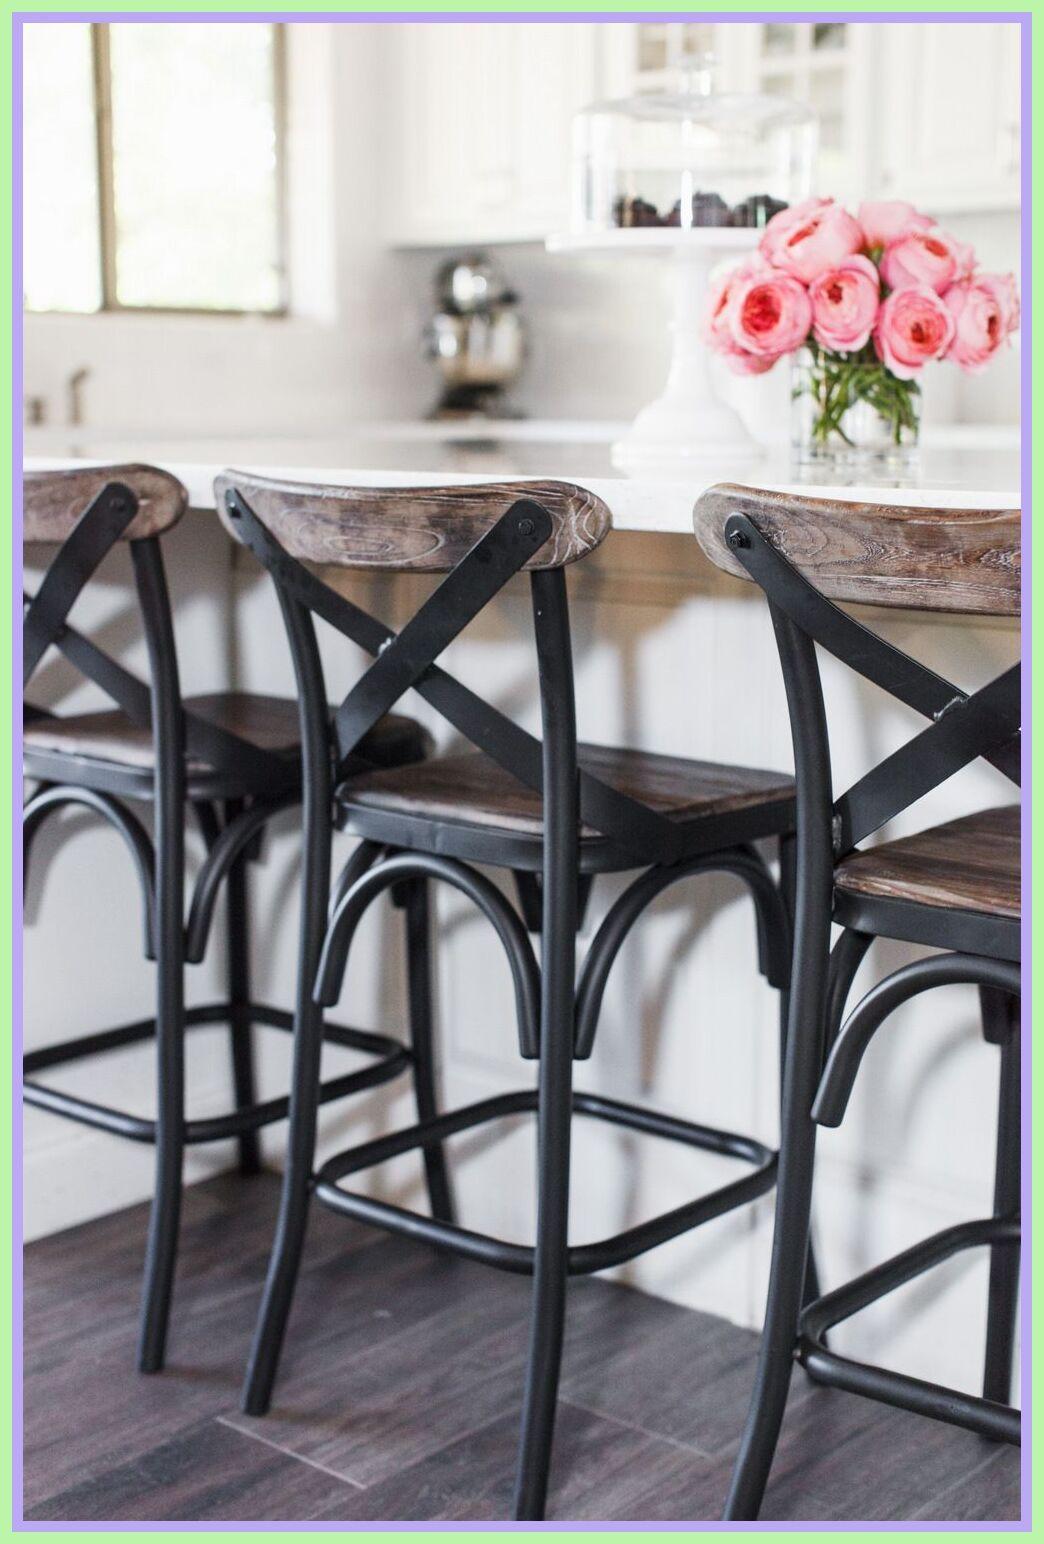 25+ Farmhouse counter stools ideas